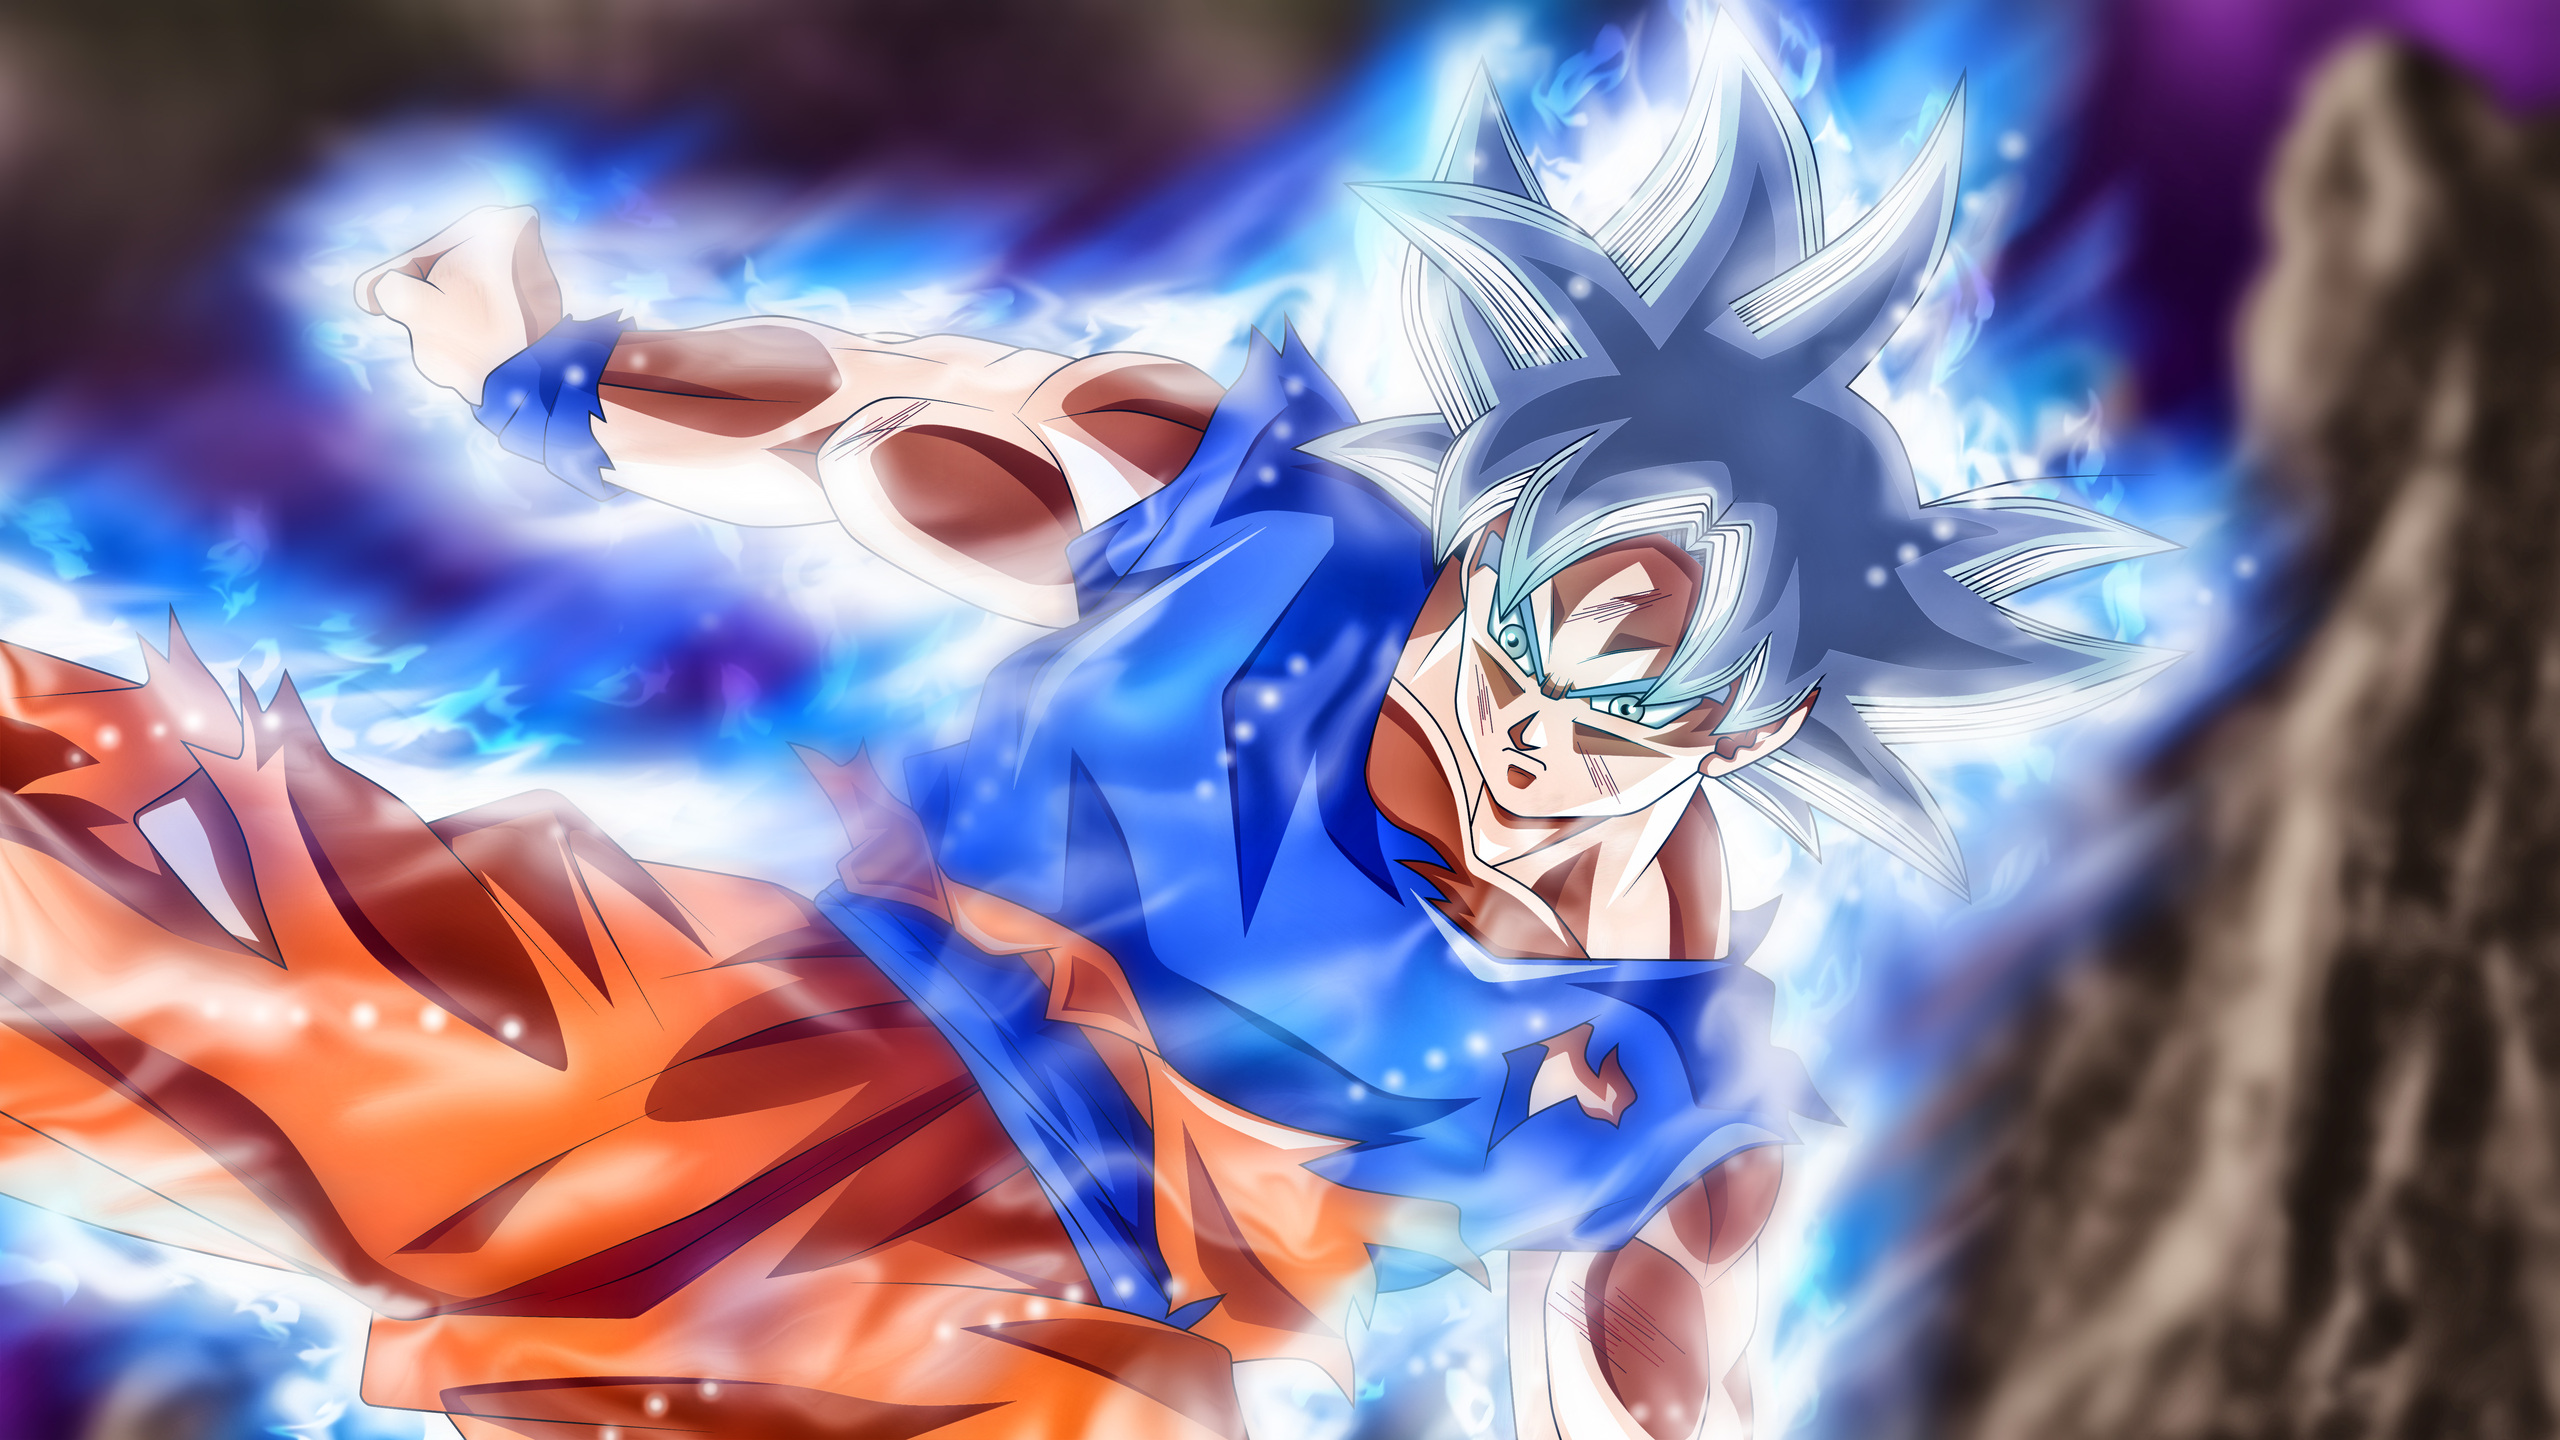 Ultra Instinct Goku Wallpaper 4k: 2560x1440 Goku Jiren Masterd Ultra Instinct 1440P